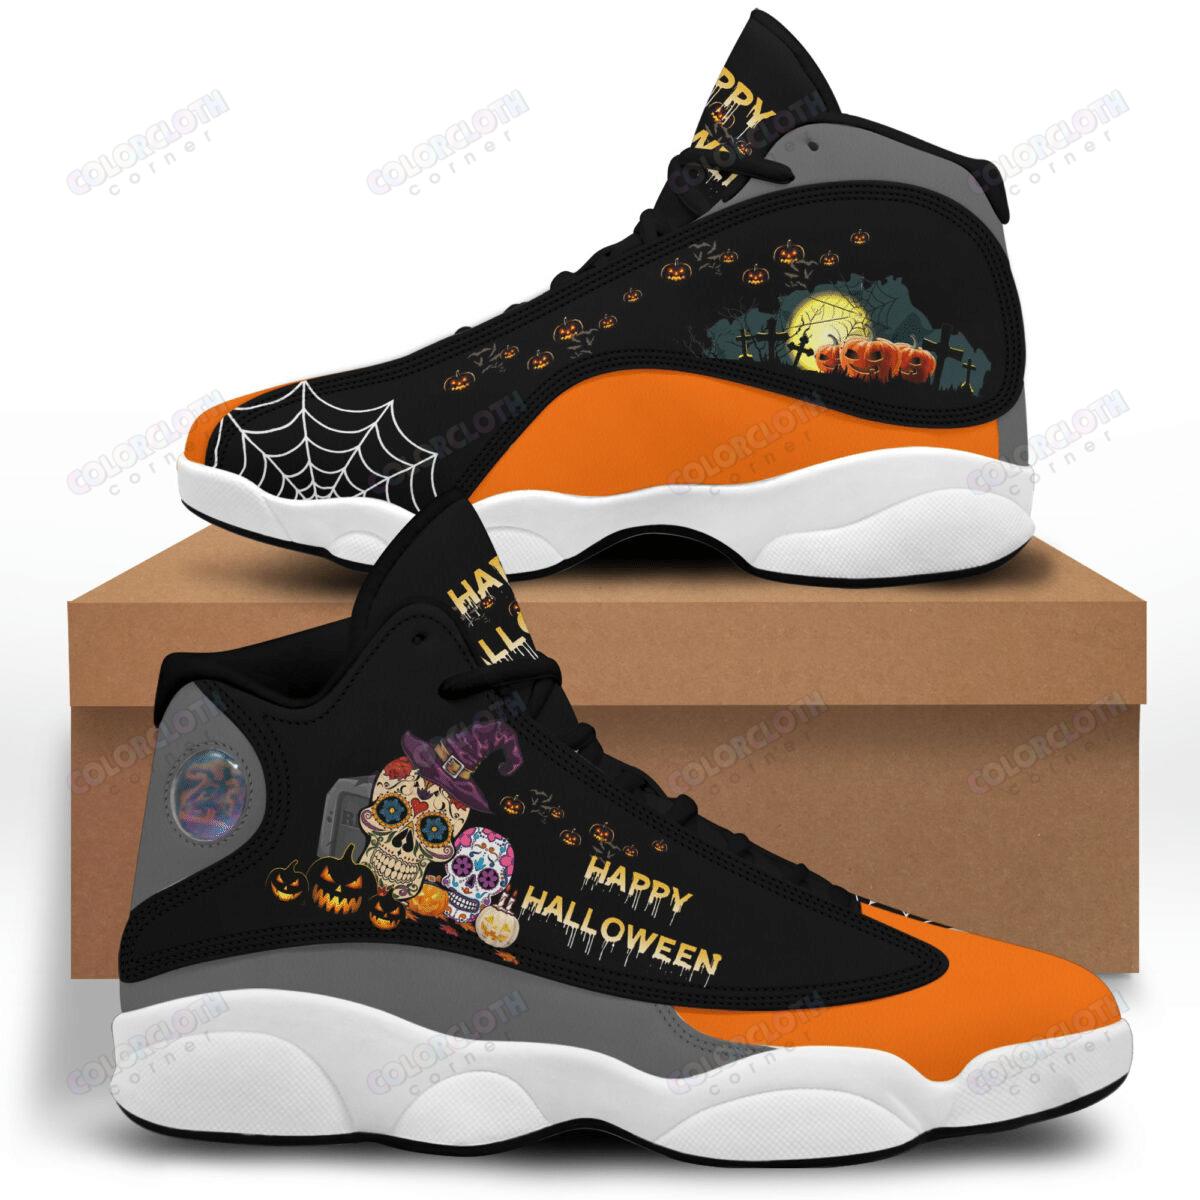 Happy Halloween skull Air Jordan 13 Shoes